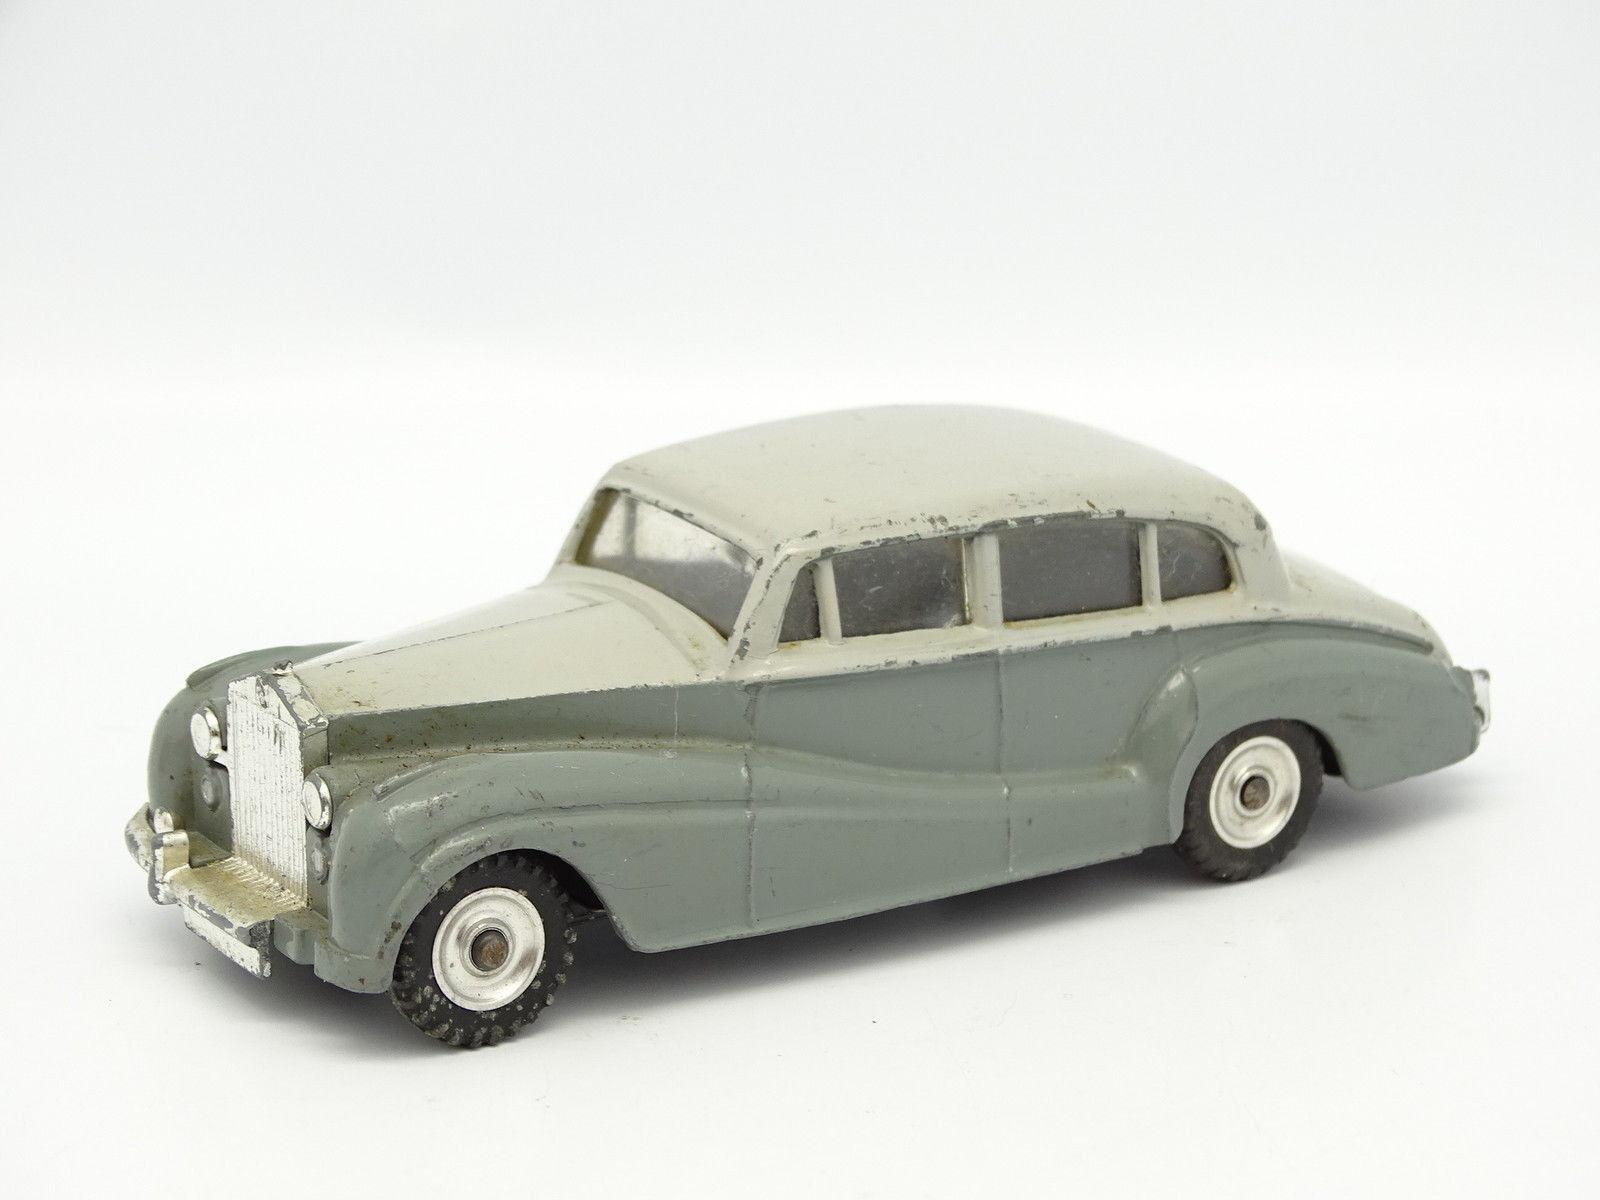 Dinky Juguetes GB Sb 1 43 - Rolls Royce plata Wraith